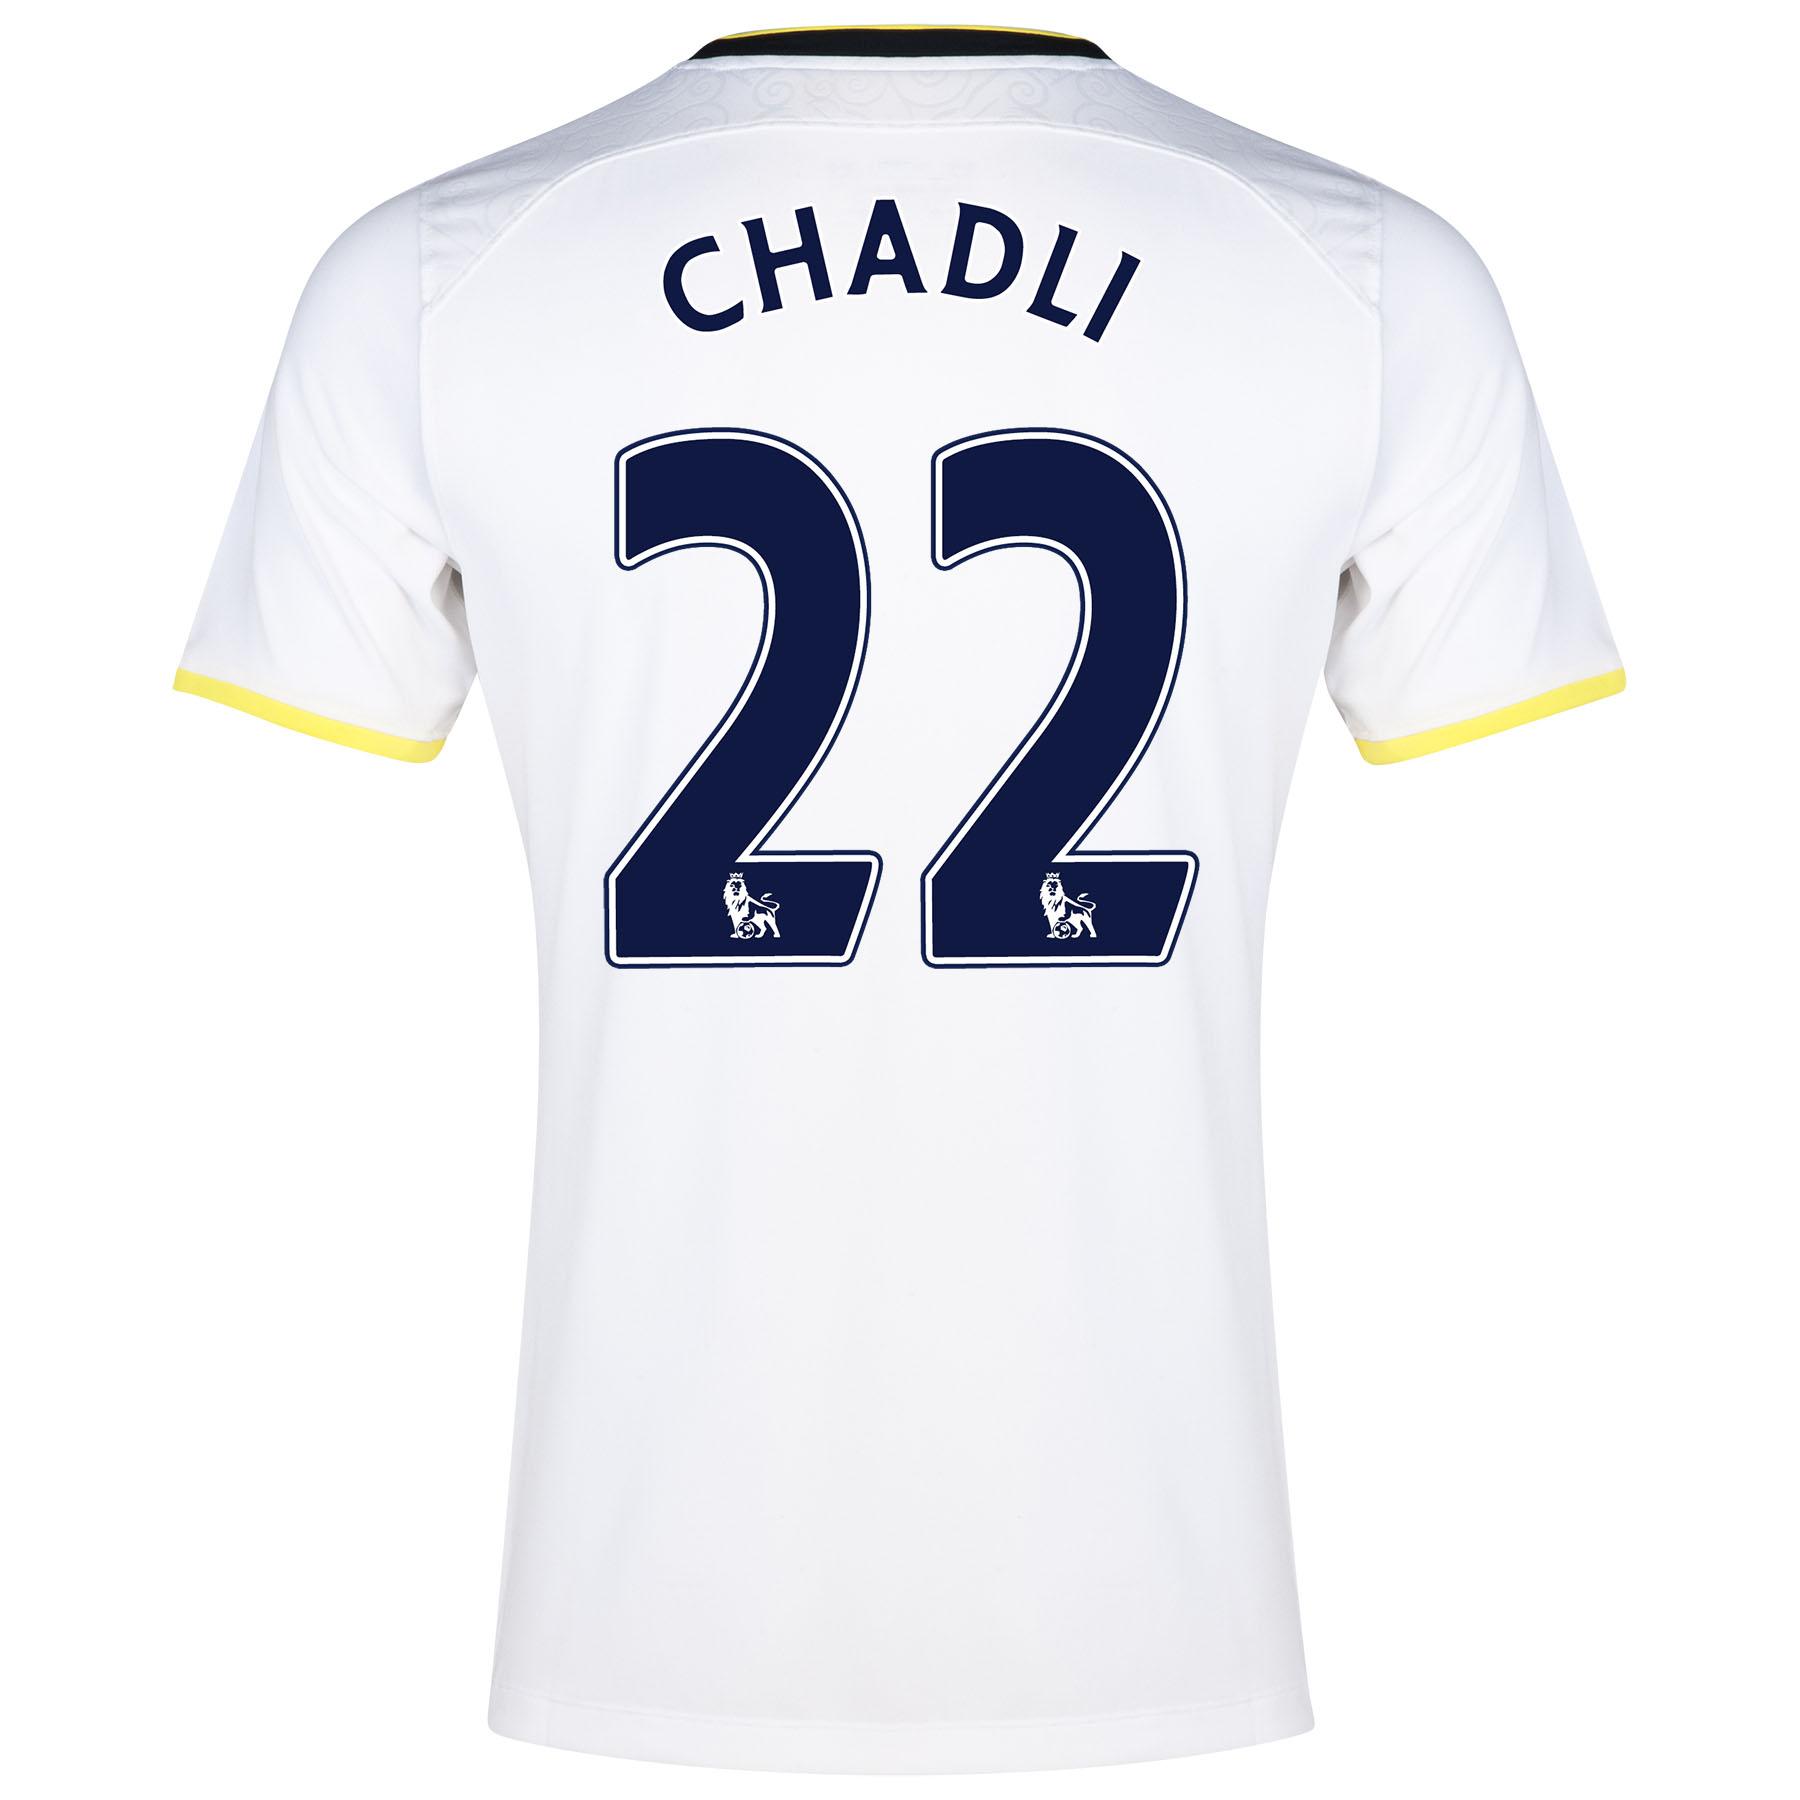 Tottenham Hotspur Home Shirt 2014/15 with Chadli 21 printing